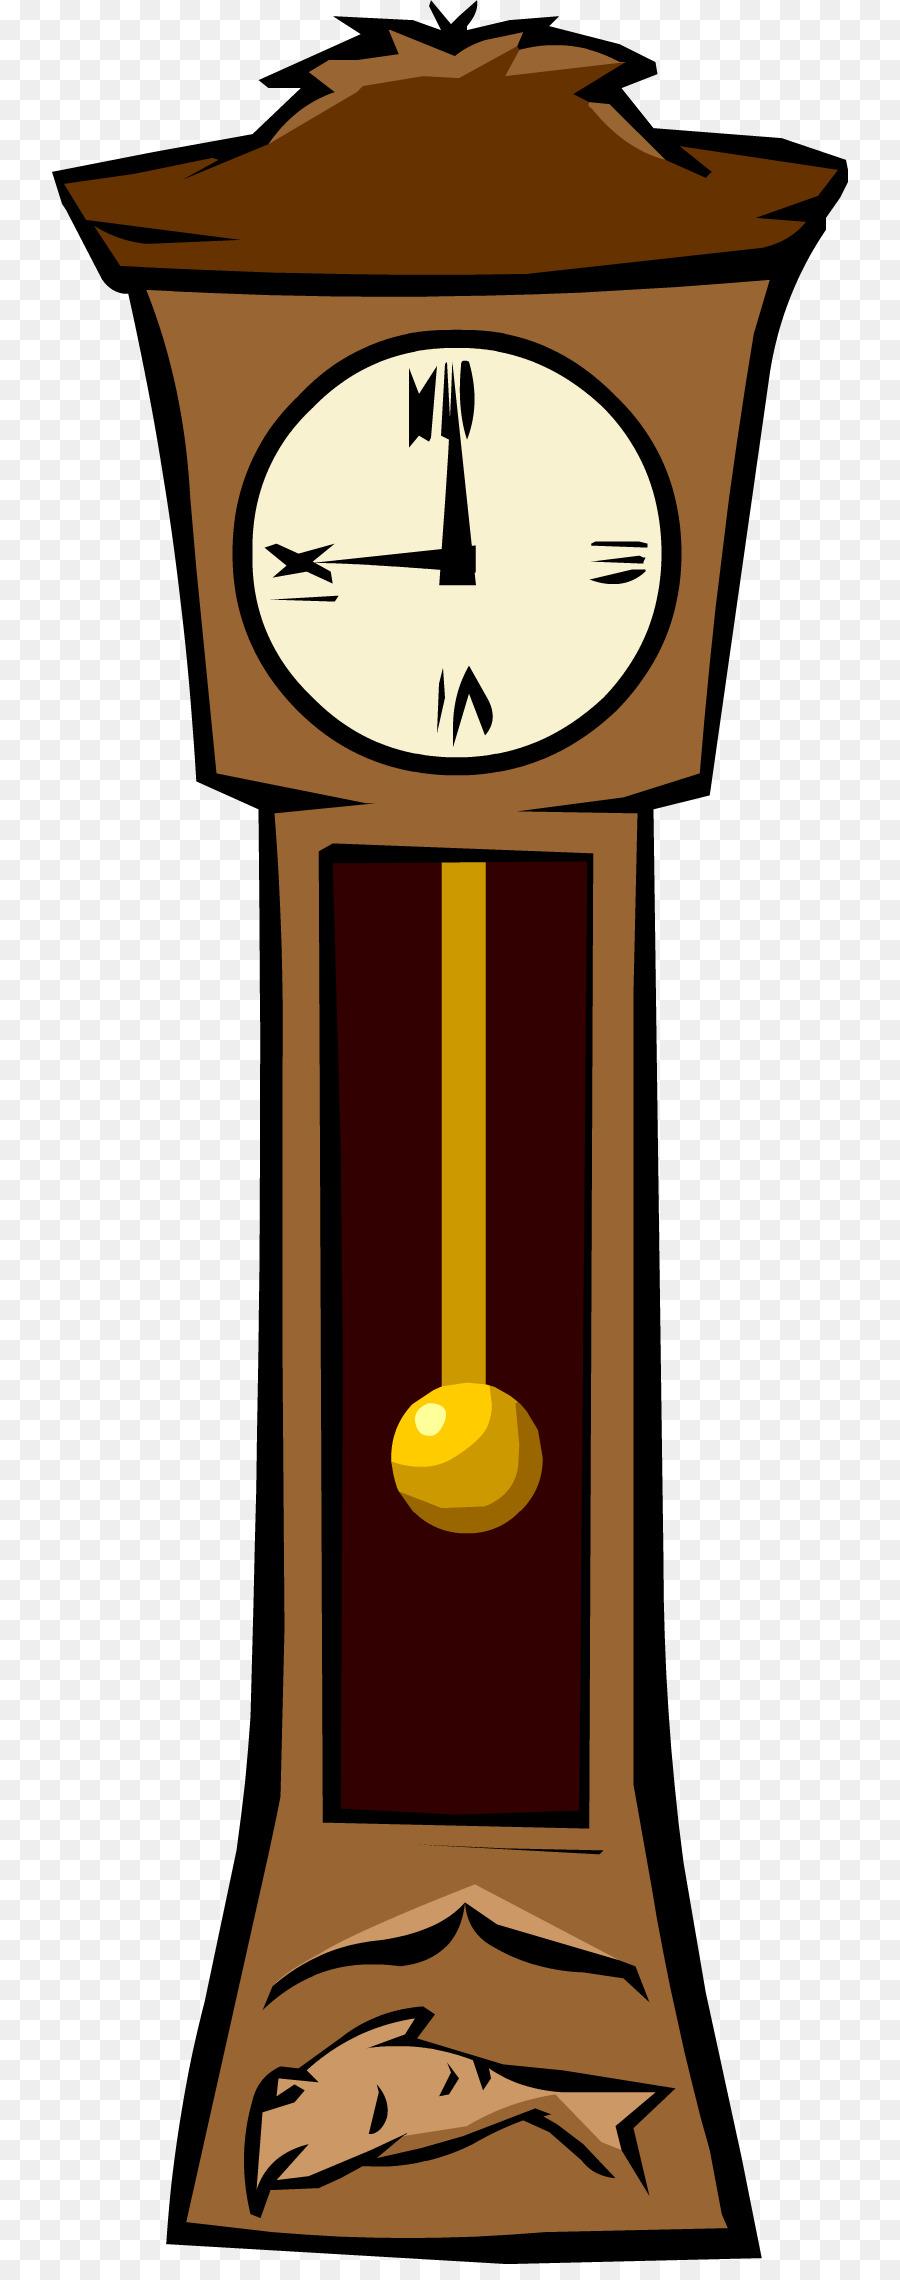 900x2280 Club Penguin Floor Amp Grandfather Clocks Clip Art